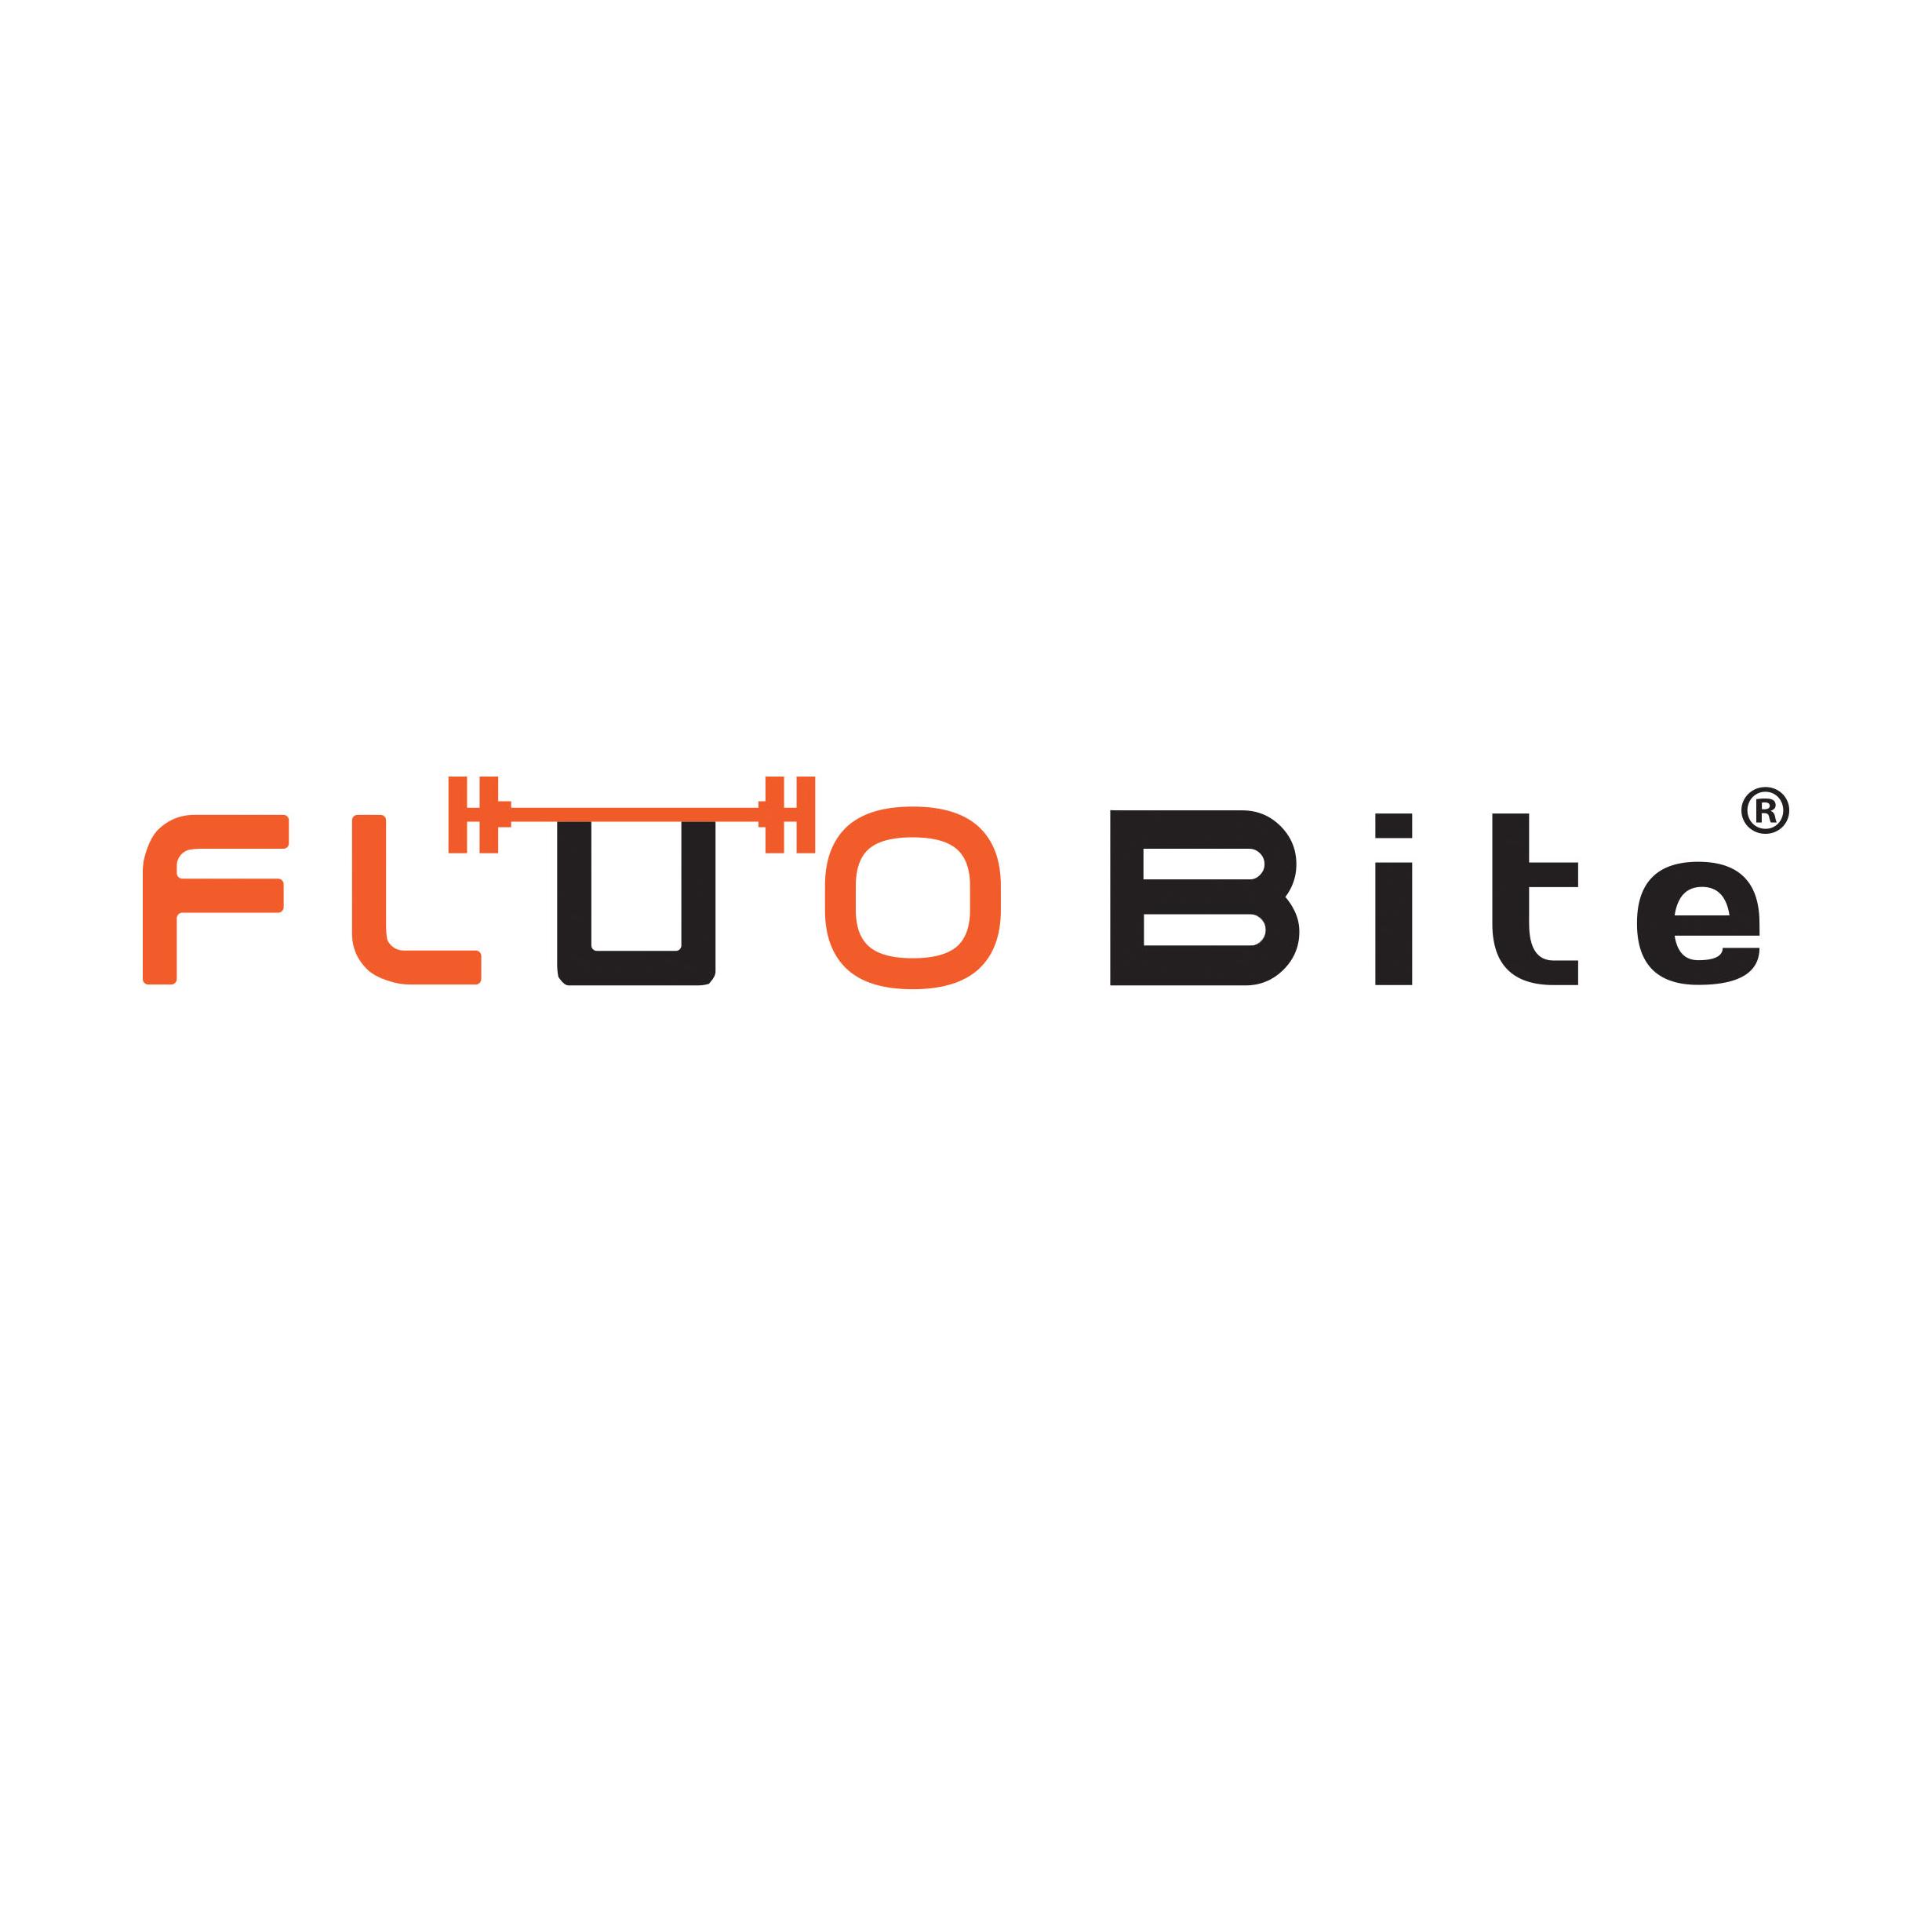 Fluobite